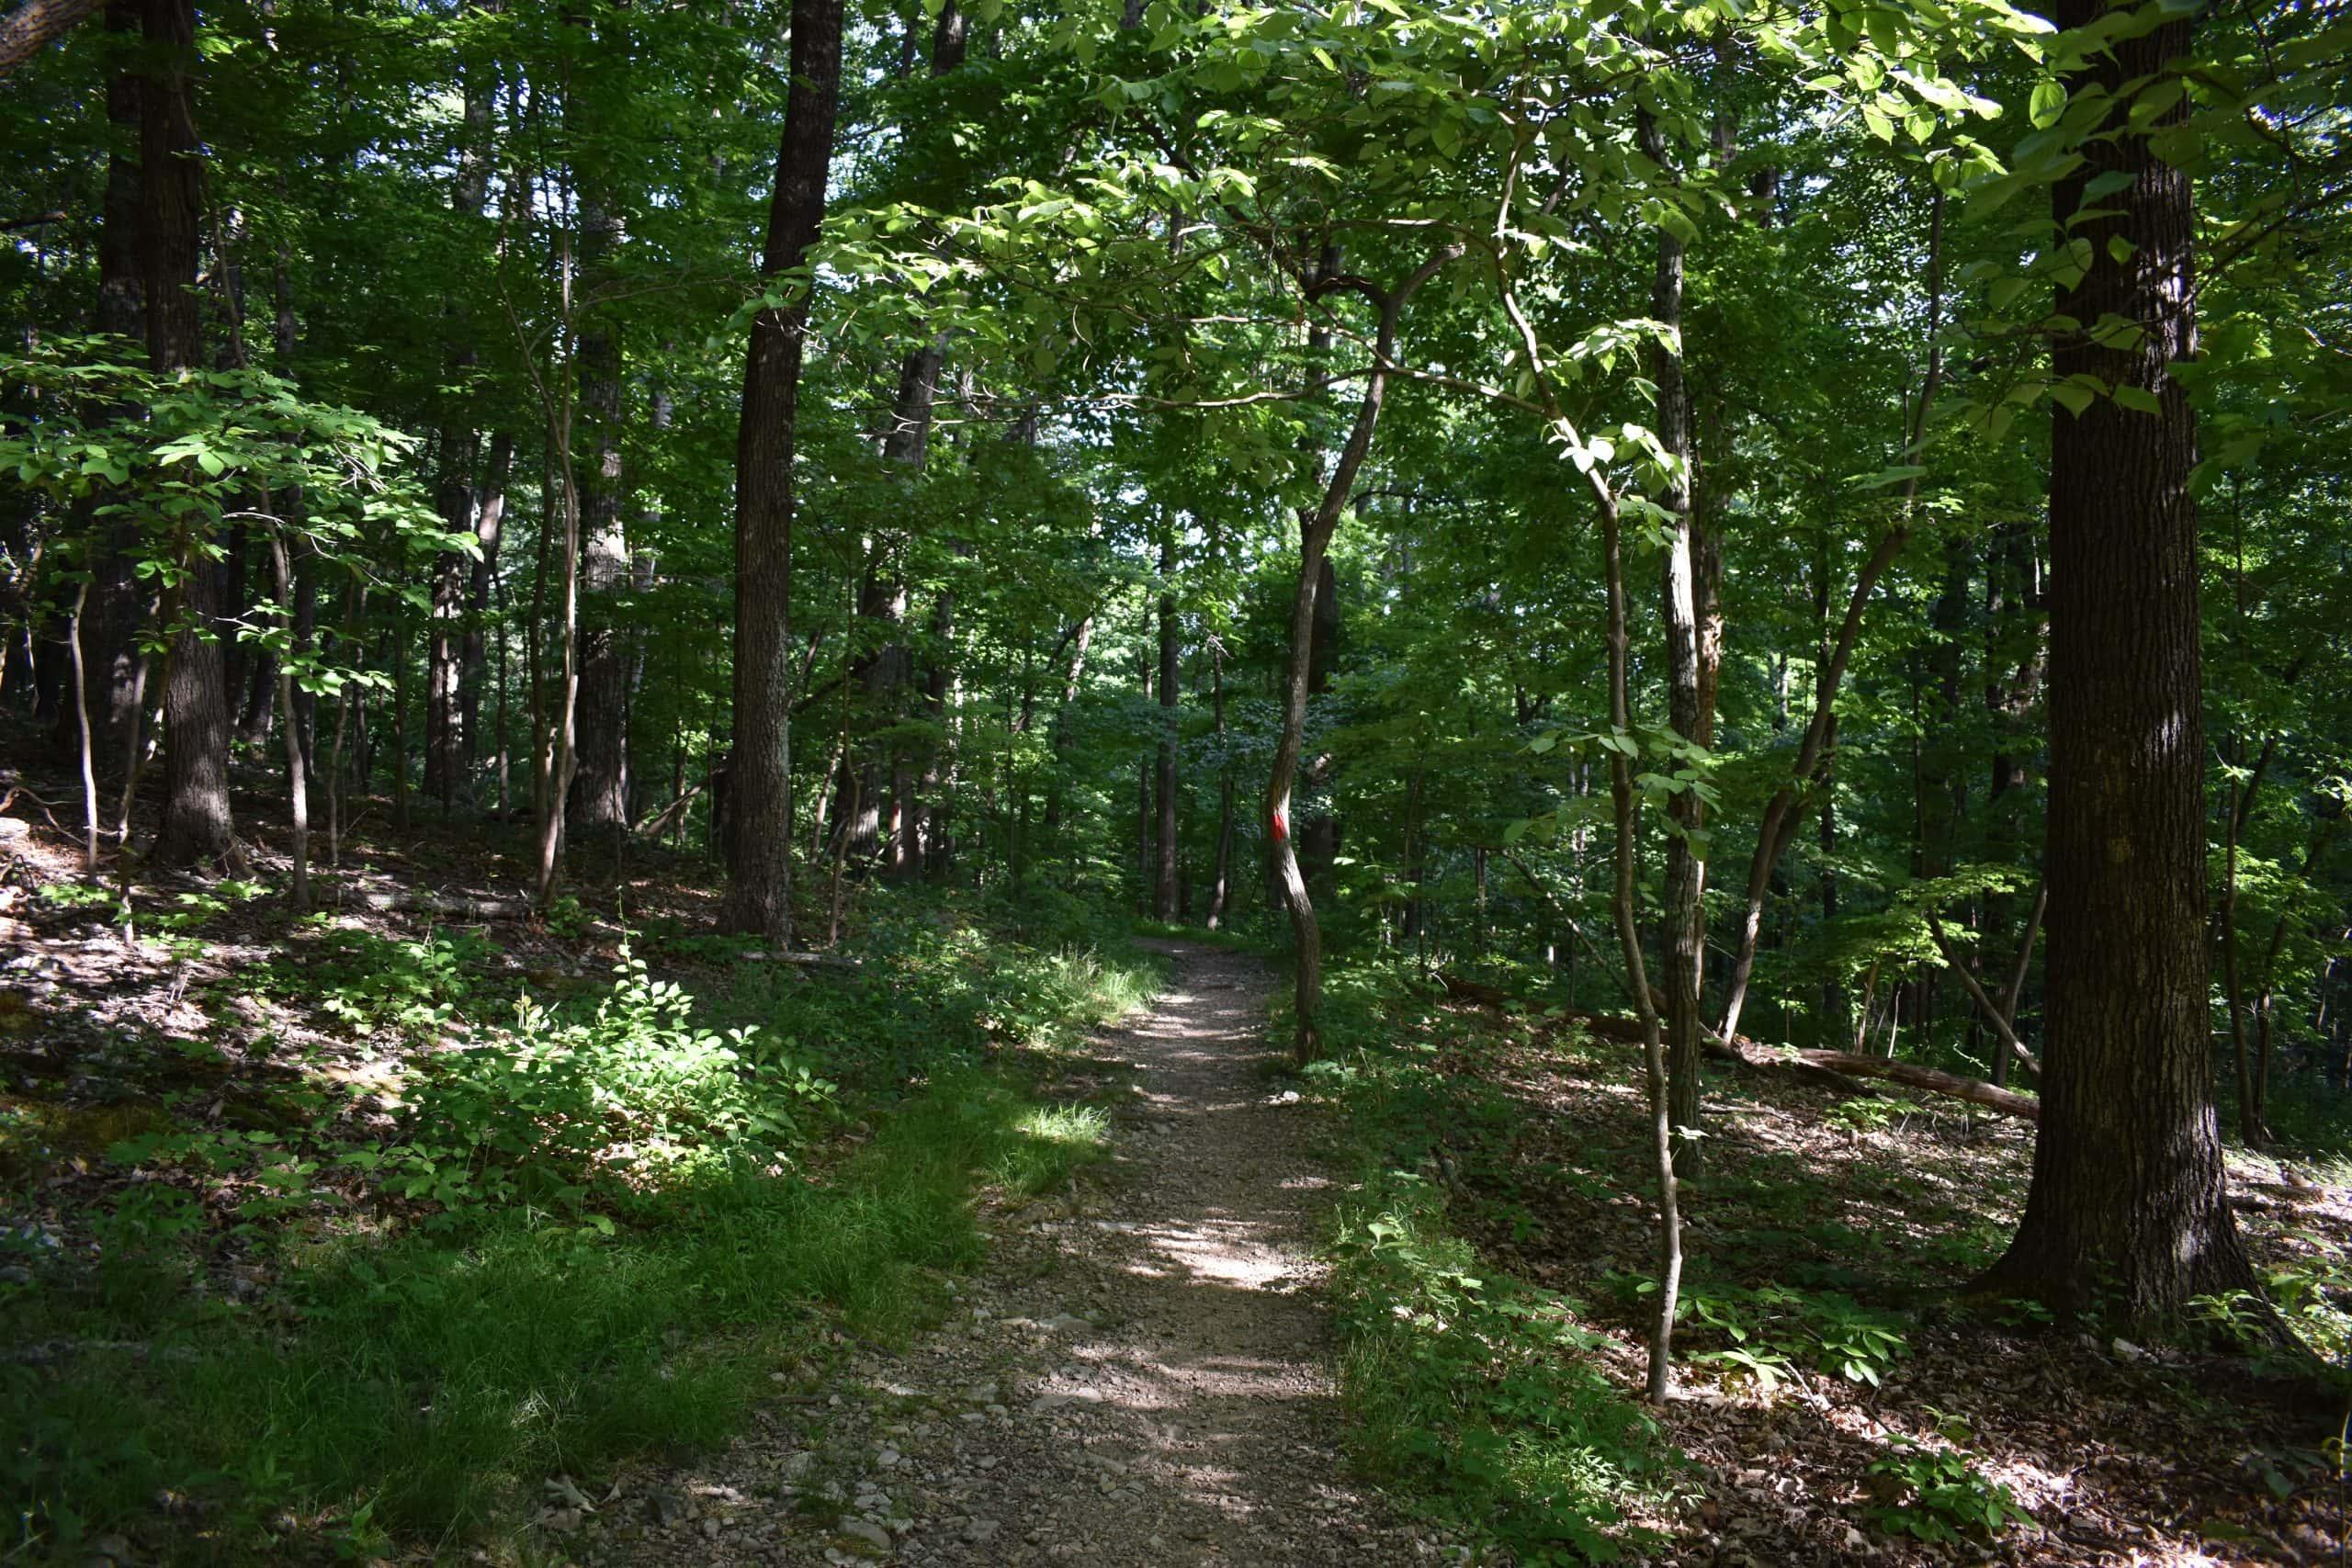 Nature Walks Near Roanoke Va - Chestnut Ridge Trail - Yoanoke